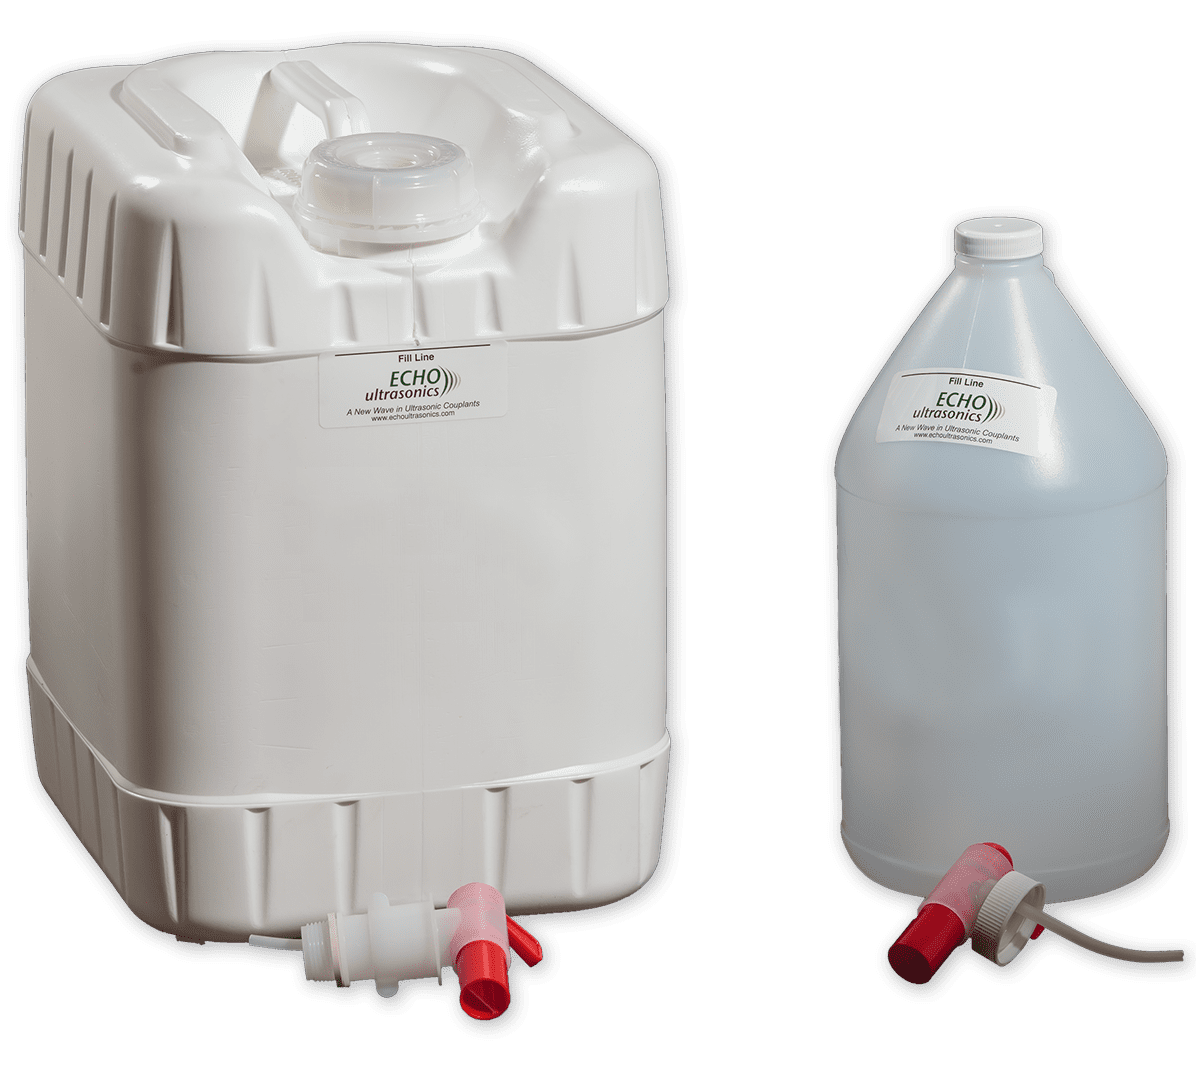 Glycerin And Propylene Glycol Industrial Ultrasonic Couplant